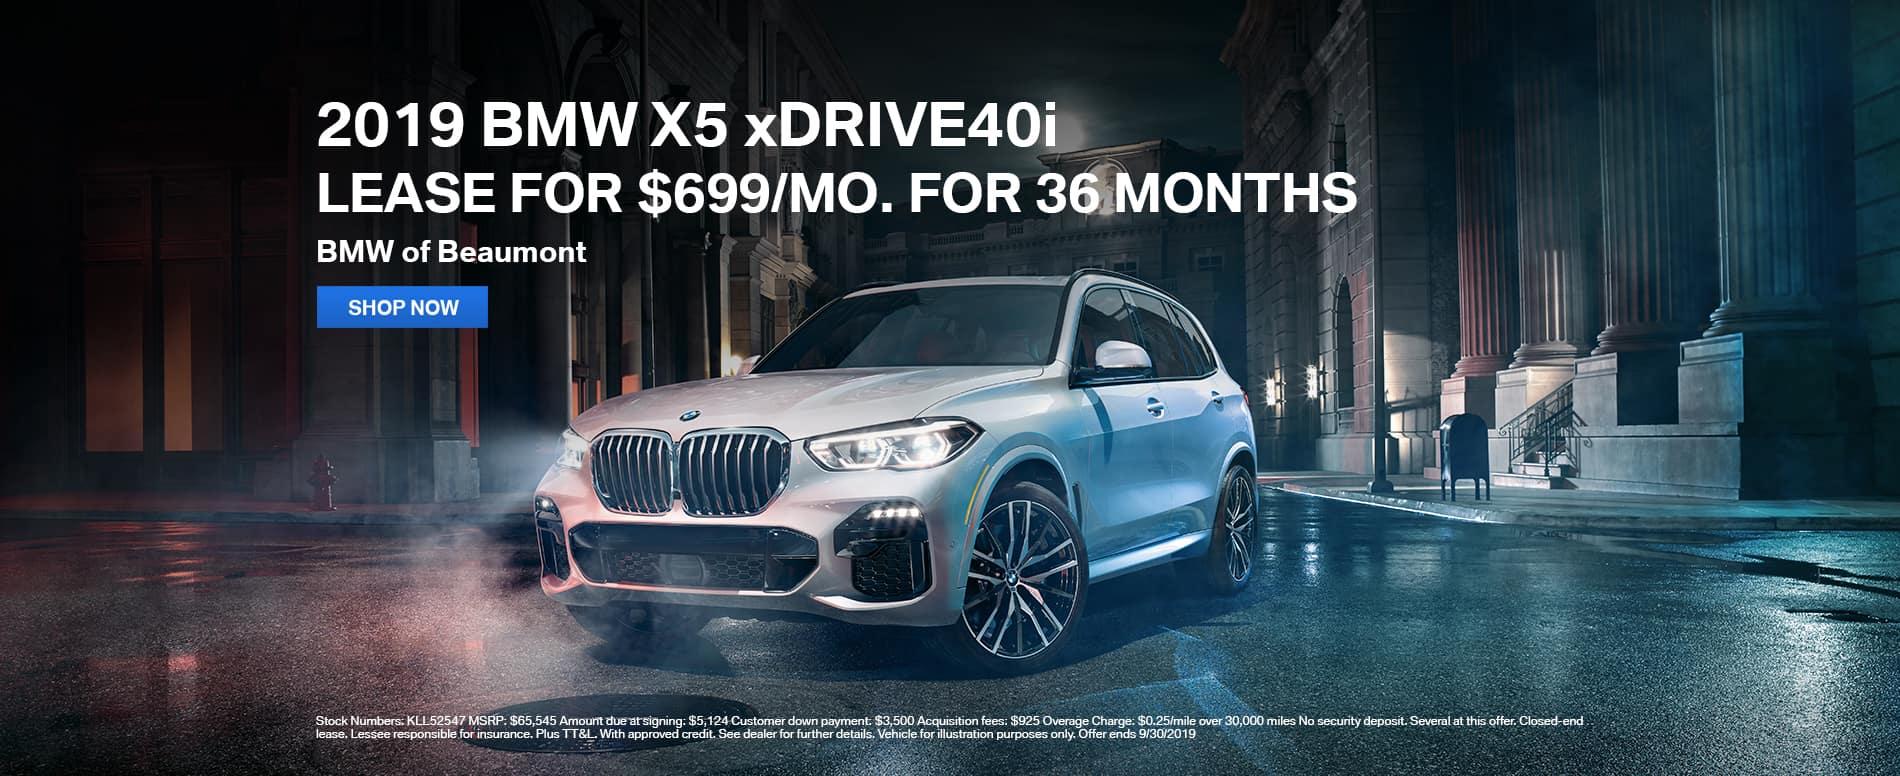 2019_Beaumont_BMW_X5_xDRIVE40i_Lease